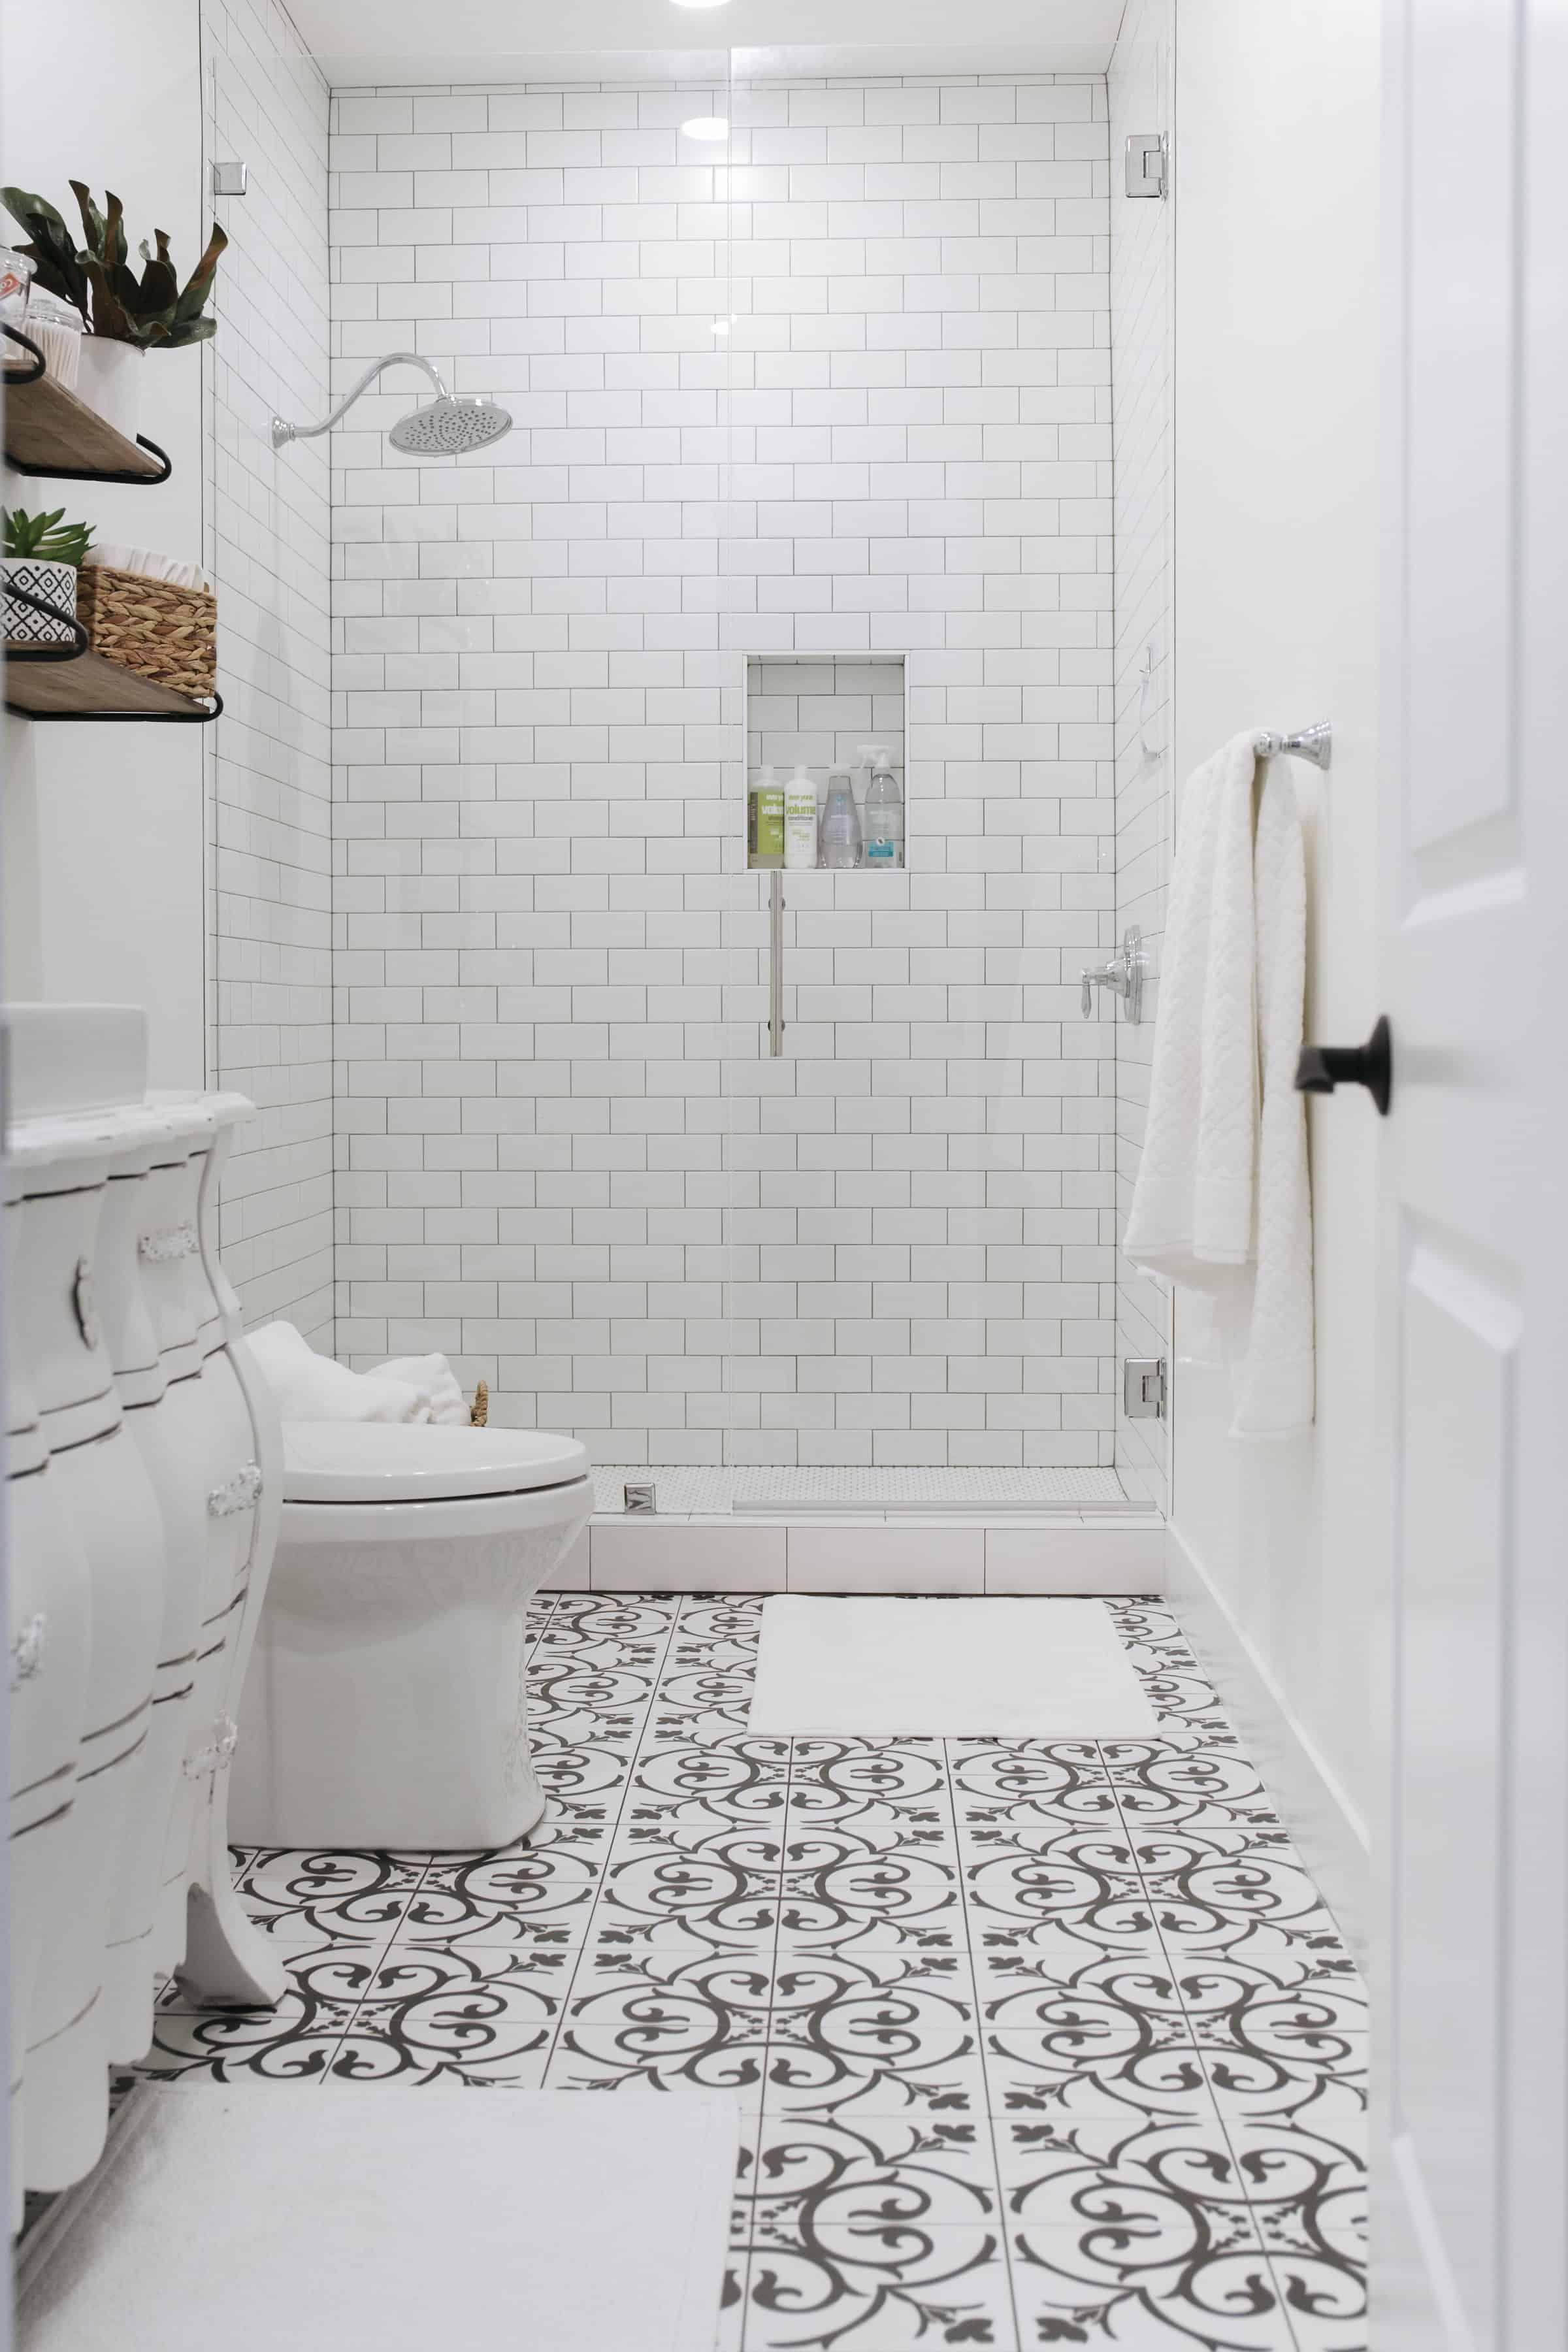 38 fantastic terrific tiles images fantastic terrific tiles images rh pinterest com